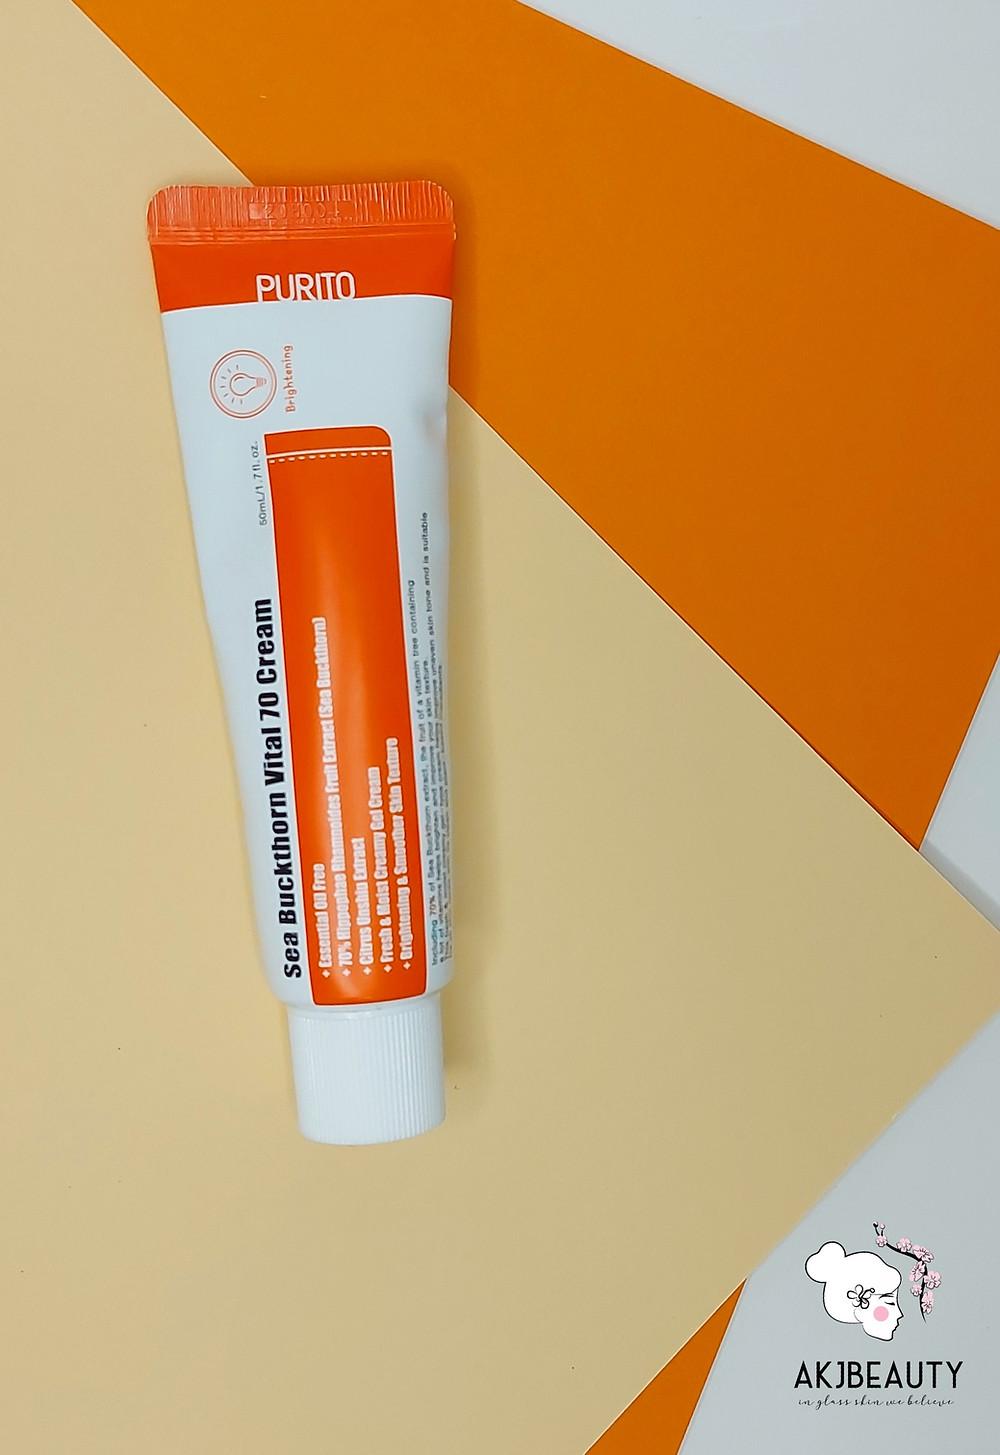 PURITO - Sea Buckthorn Vital 70 Cream